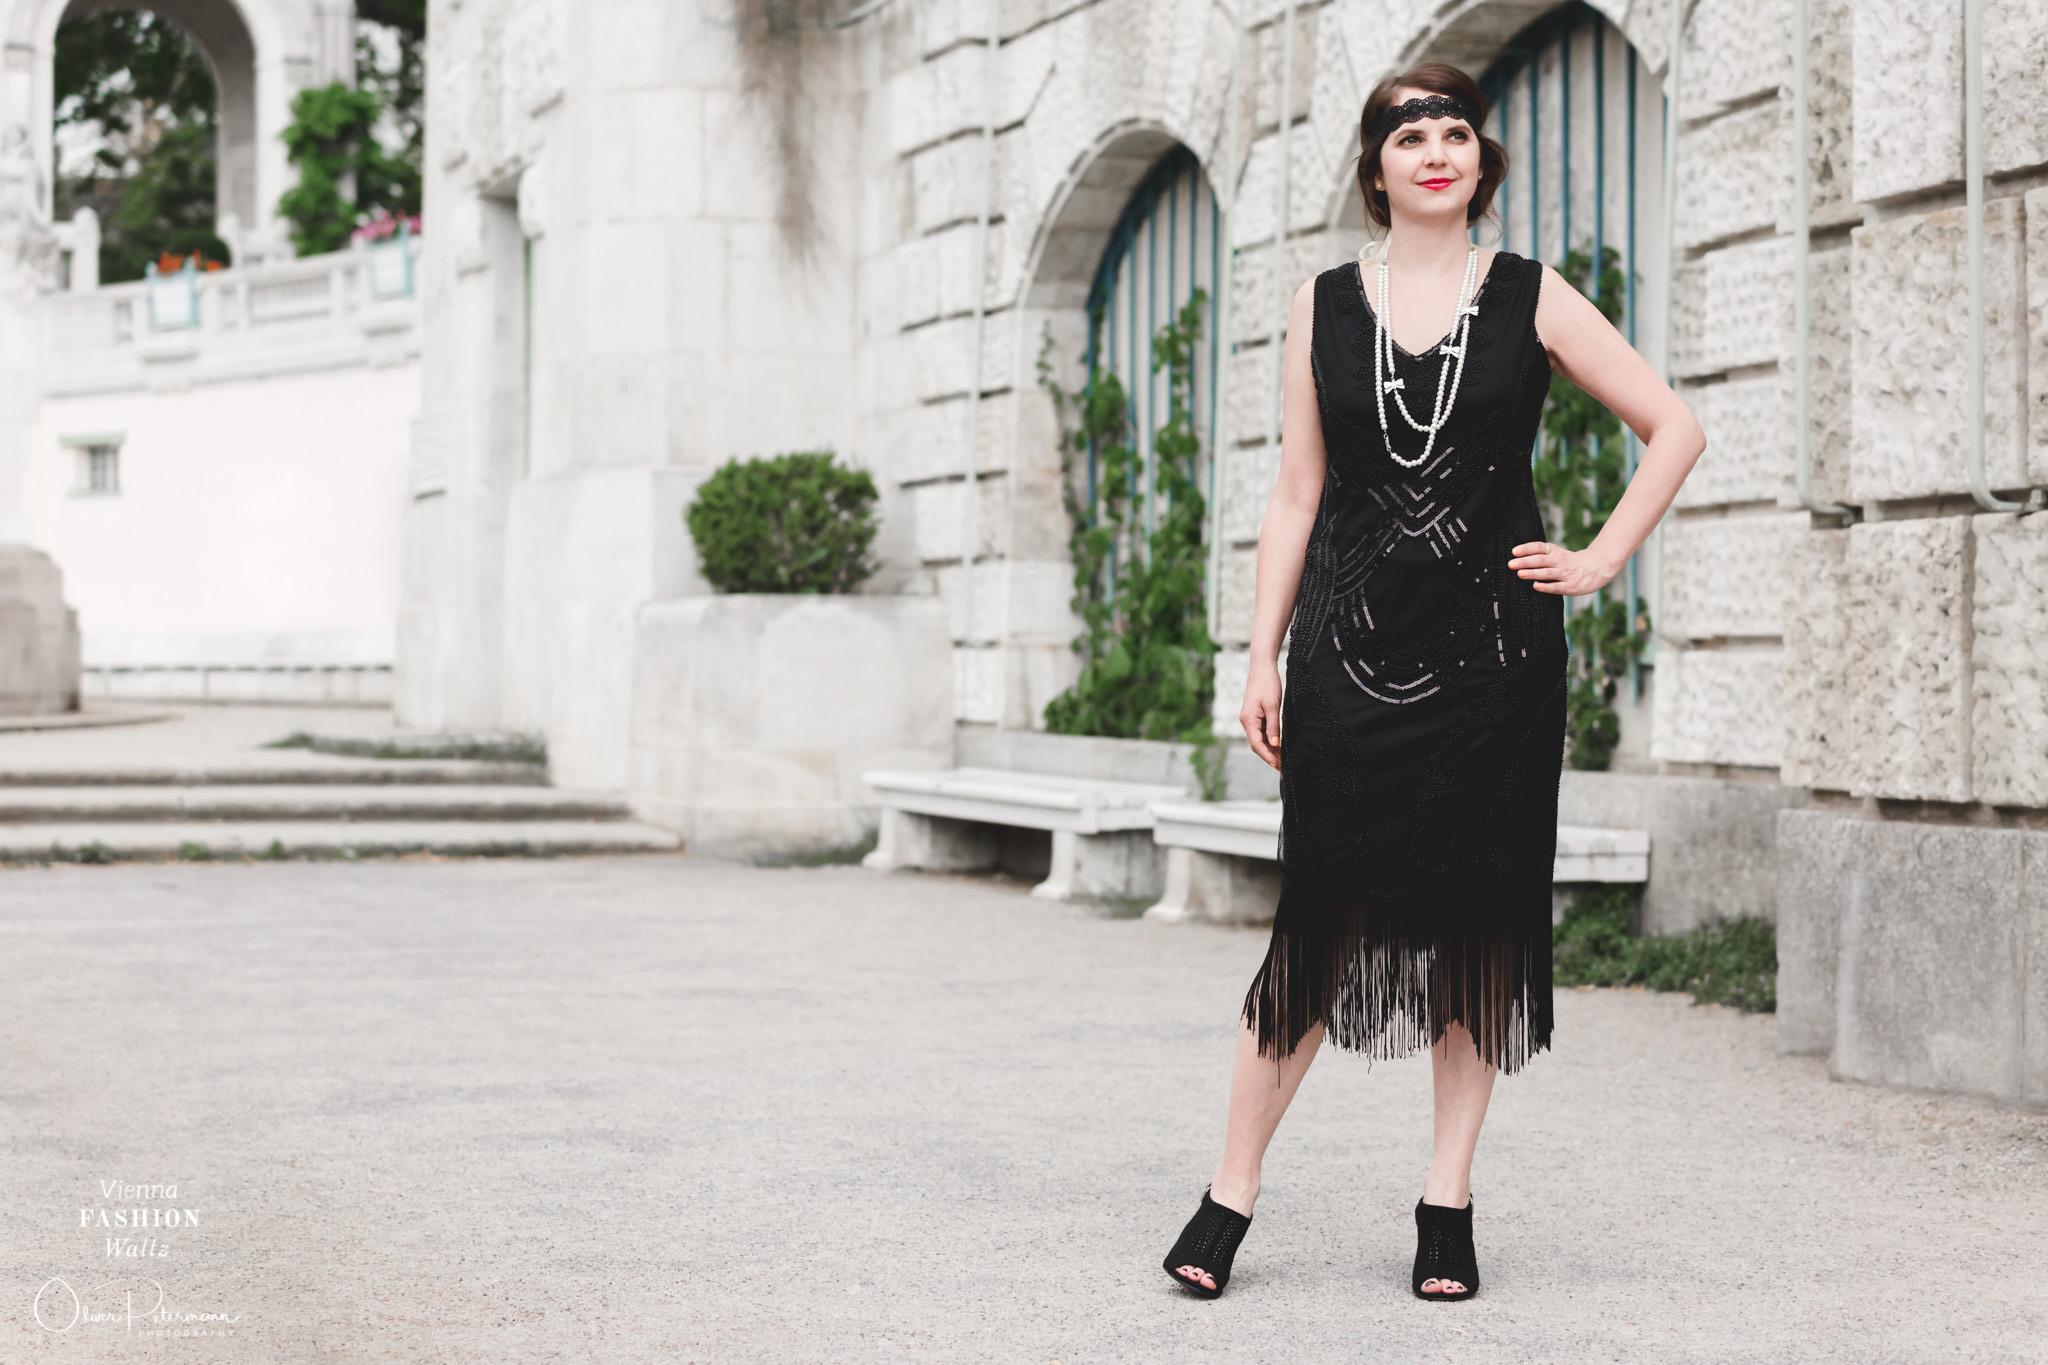 20er Jahre Gatsby Style Outfit Fashion Lifestyleblog www.viennafashionwaltz.com Oliver Petermann Photography